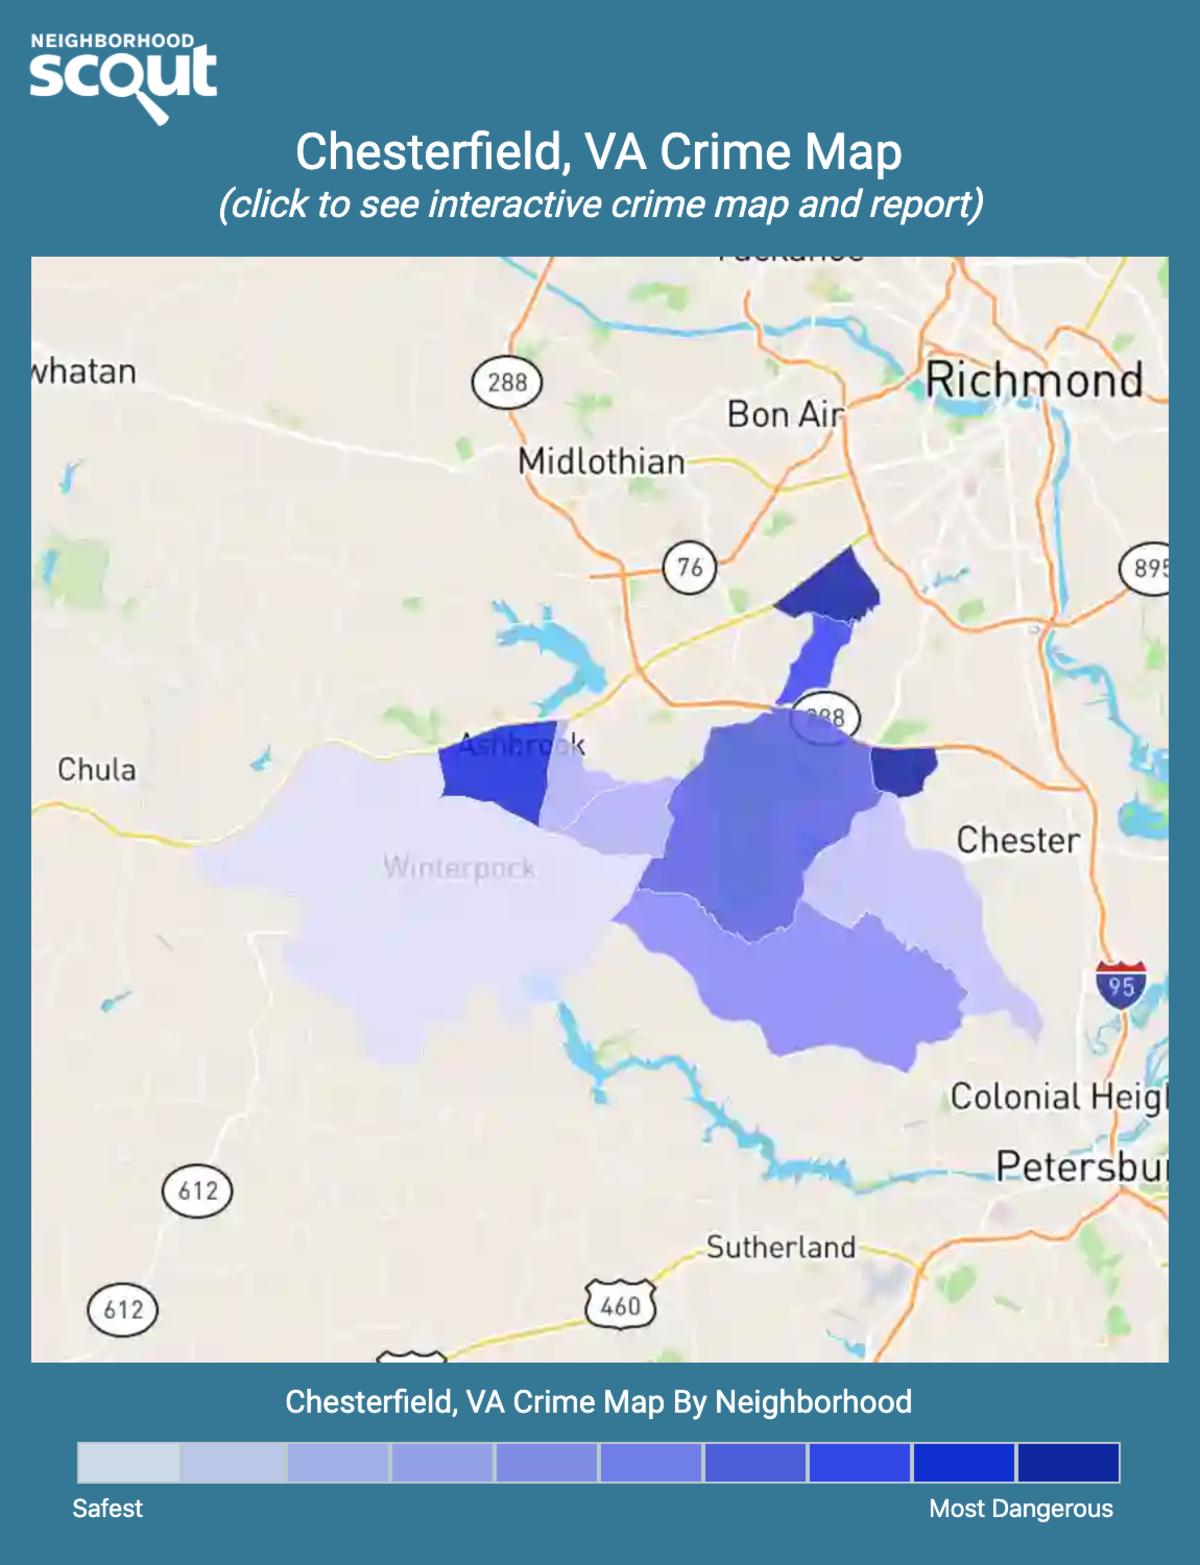 Chesterfield, Virginia crime map